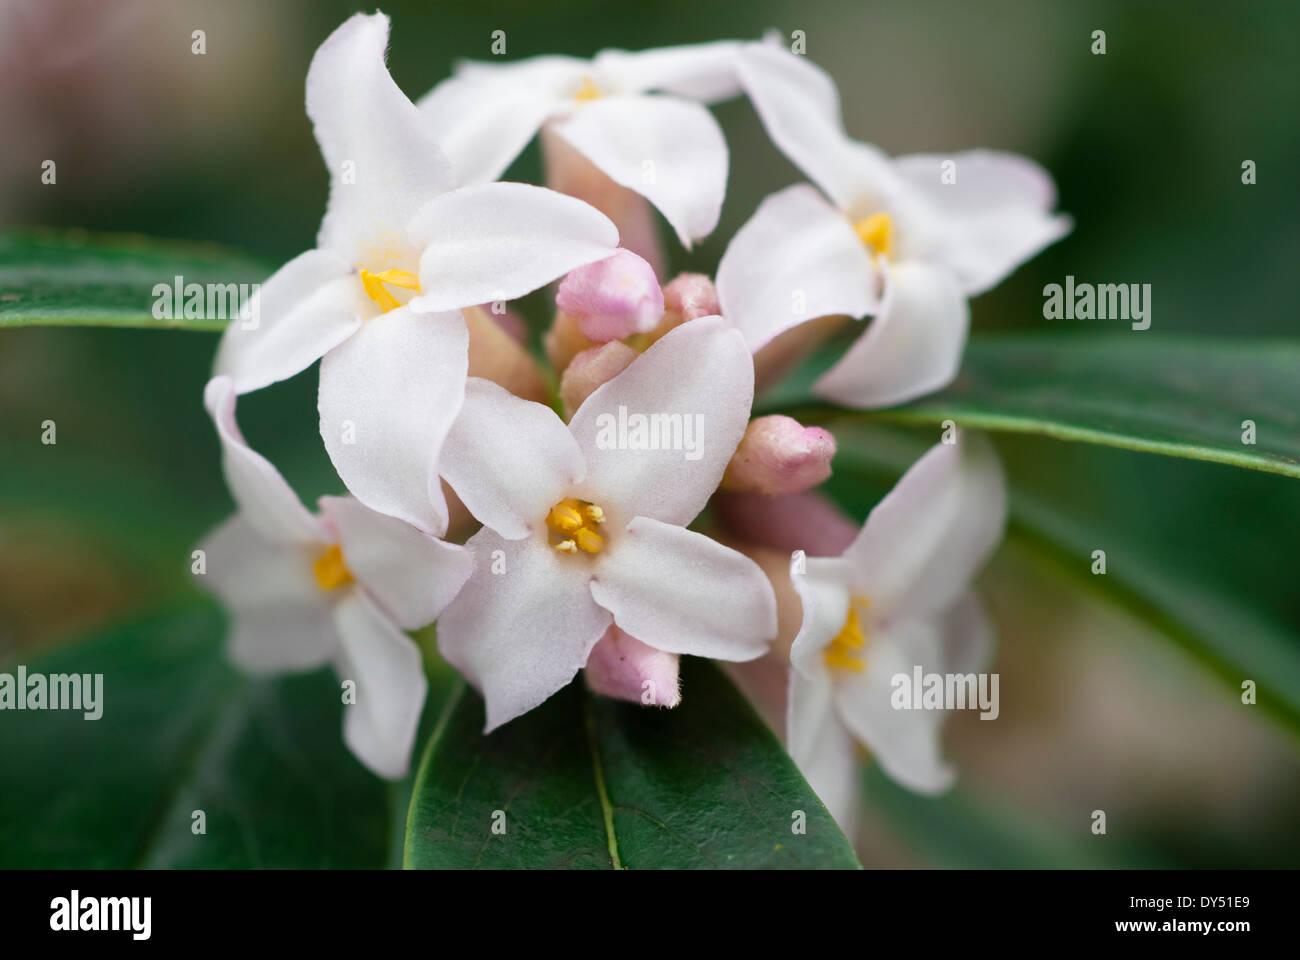 Daphne bholua, Shrub,December. Portrait of white flowers. - Stock Image